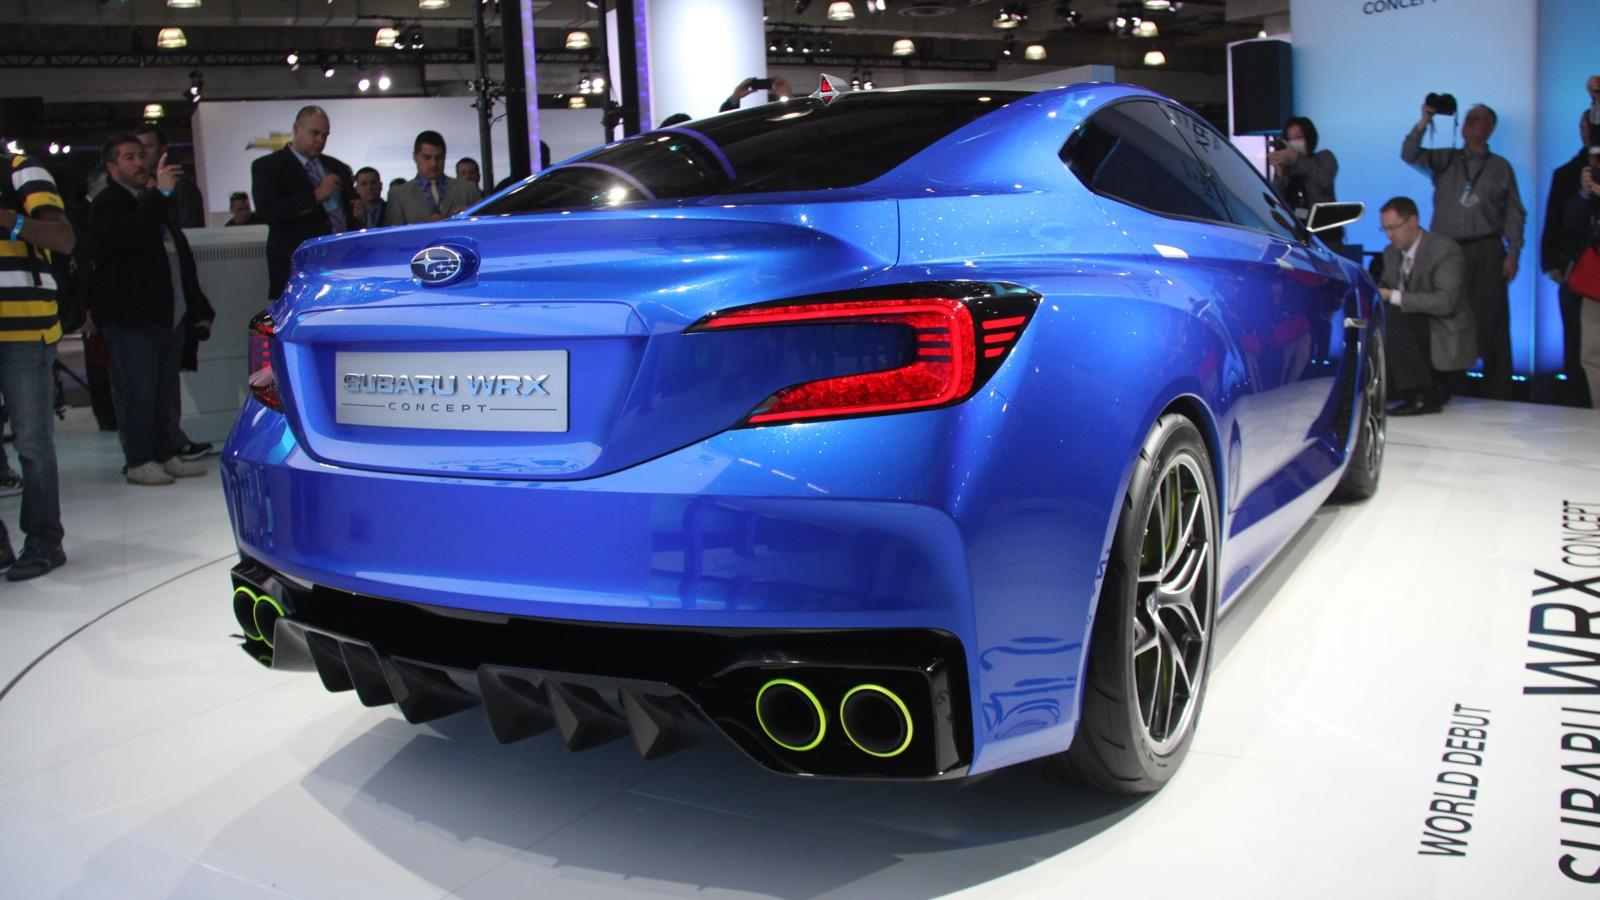 2015 Subaru WRX / WRX STI Concept Release Date | New Car ...